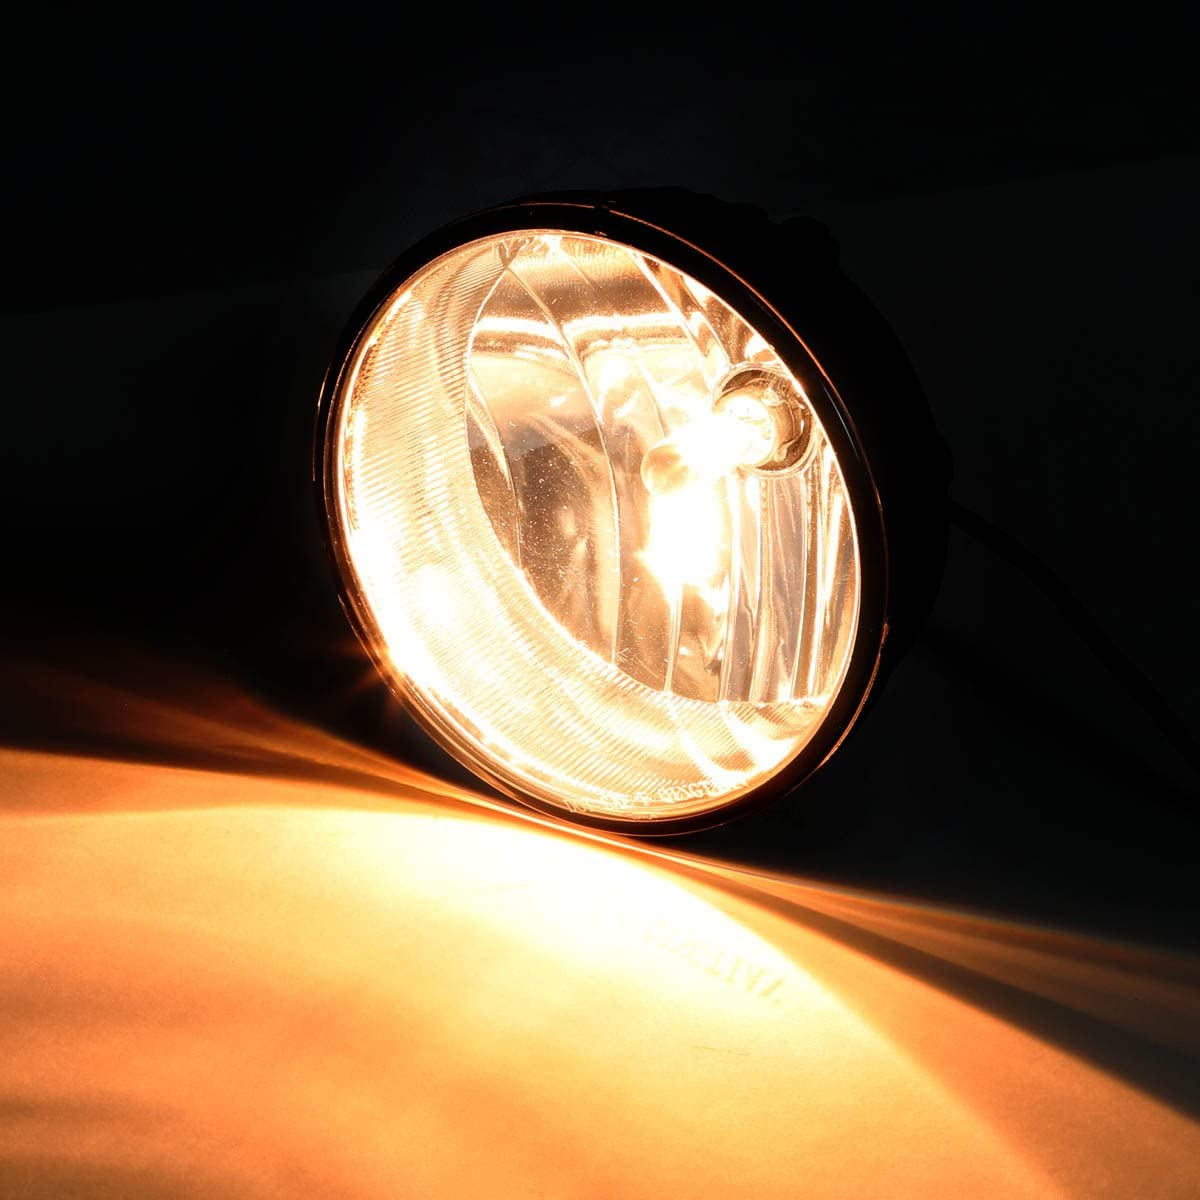 for 04-16 Sequoia//Solara//Tacoma//Tundra DNA MOTORING FL-TTA05-CH Fog Light w//Switch